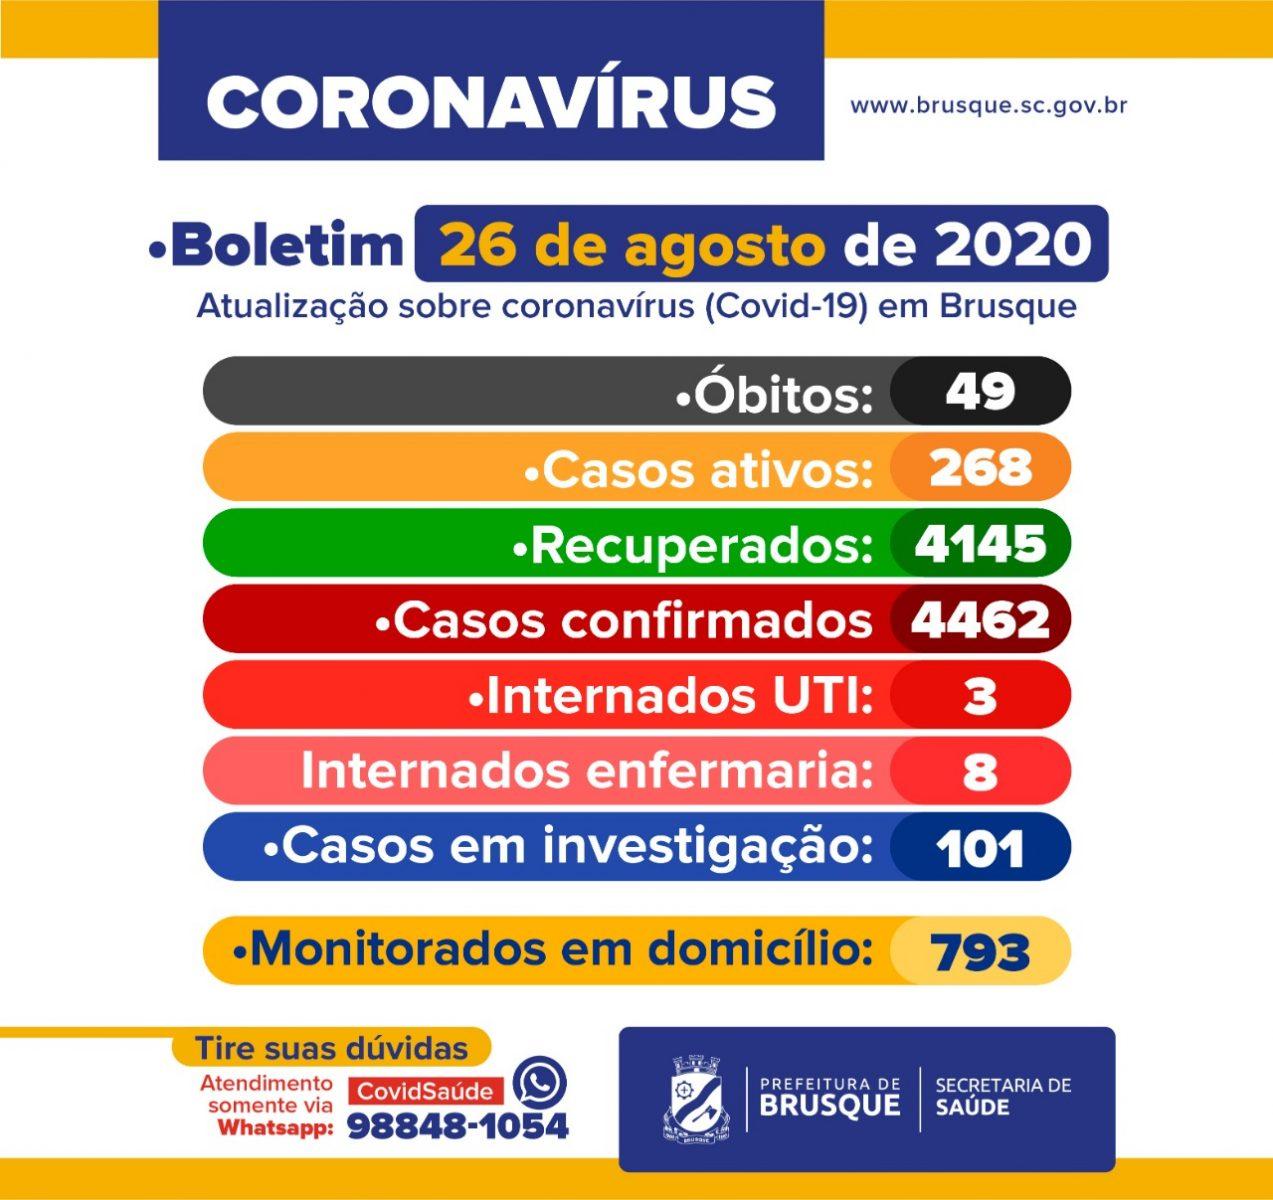 COVID-19: Boletim epidemiológico 26 de agosto